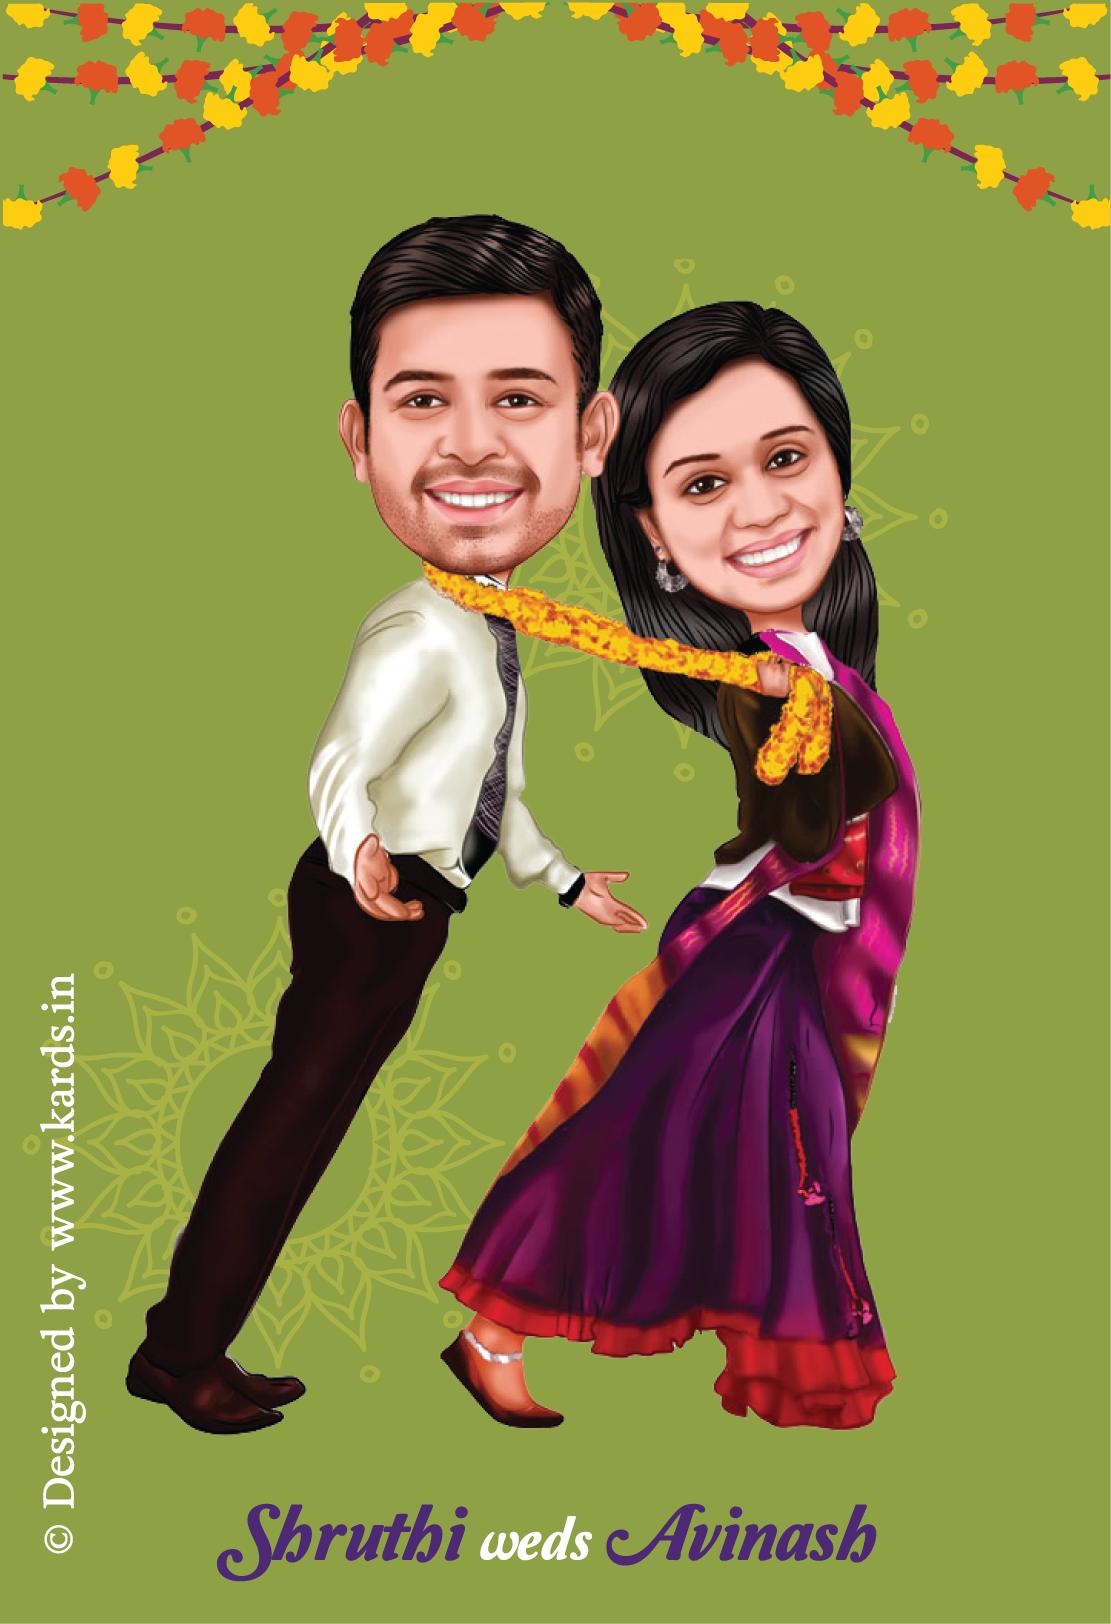 A Tanu Weds Manu Style Caricature Invitation For A Funny